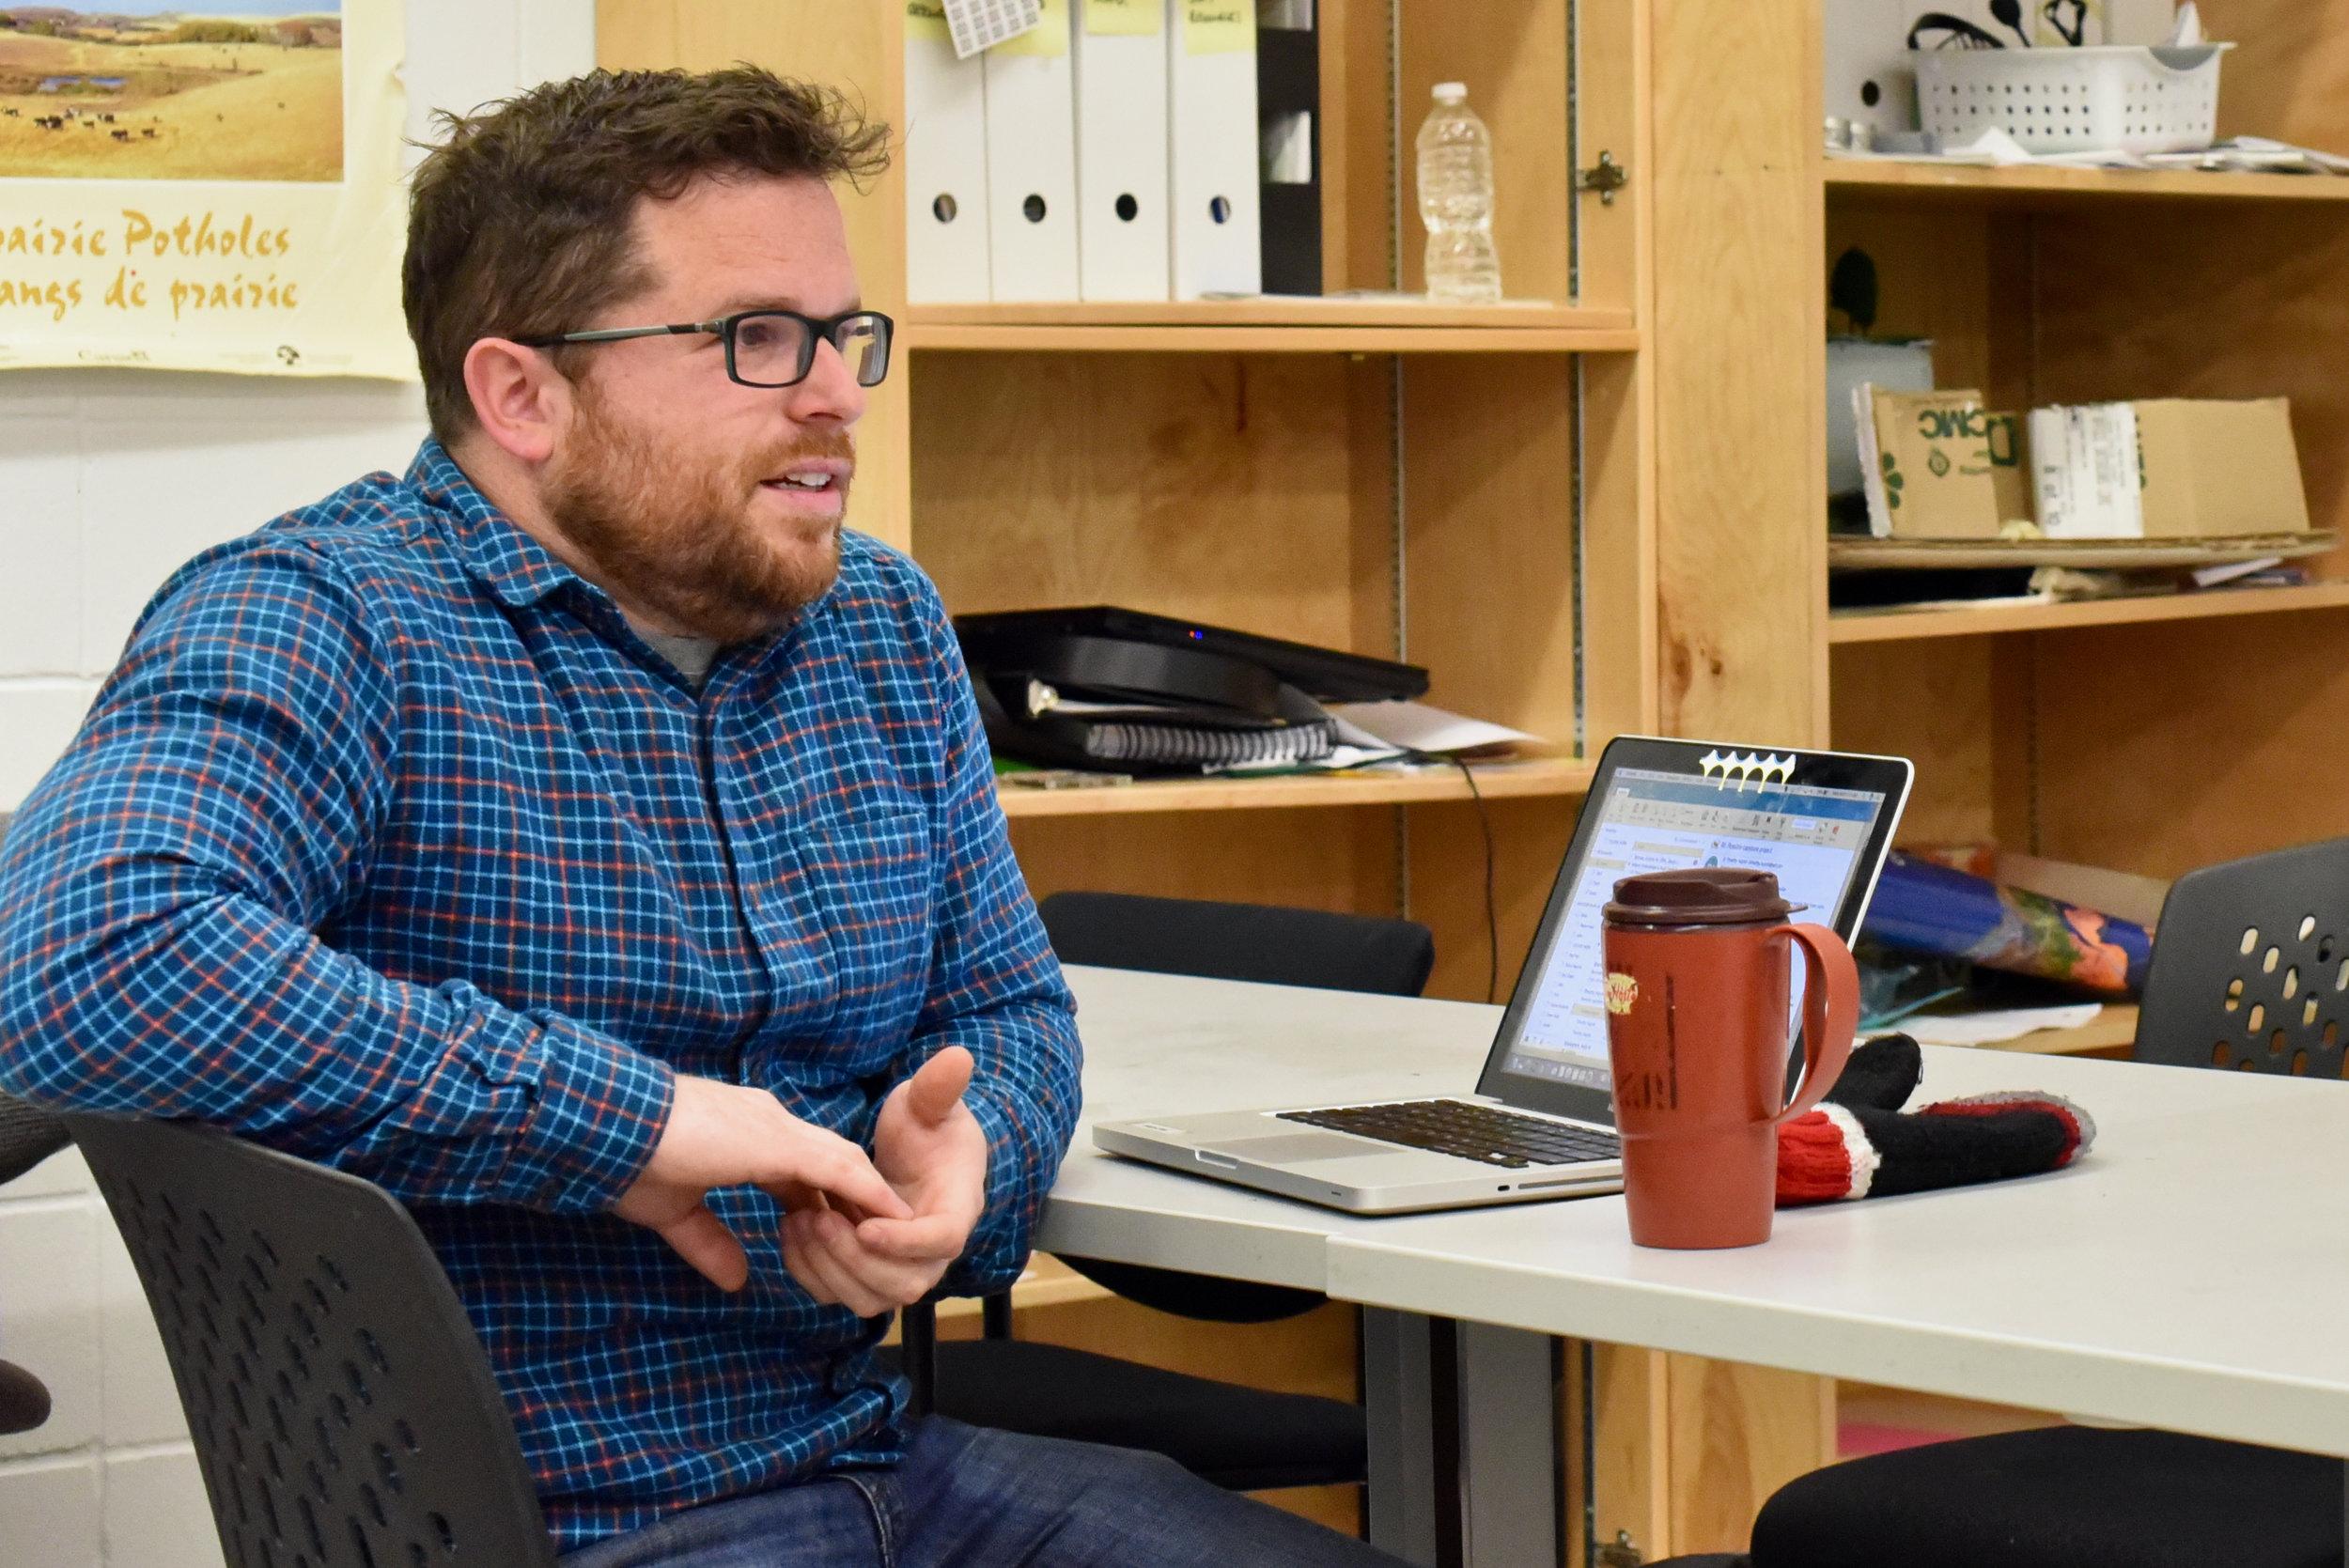 Adam Robb, a teacher at Central Memorial High School, in Calgary won Canada's environmental educator award in 2019. (Sarah Lawrynuik/The Narwhal)